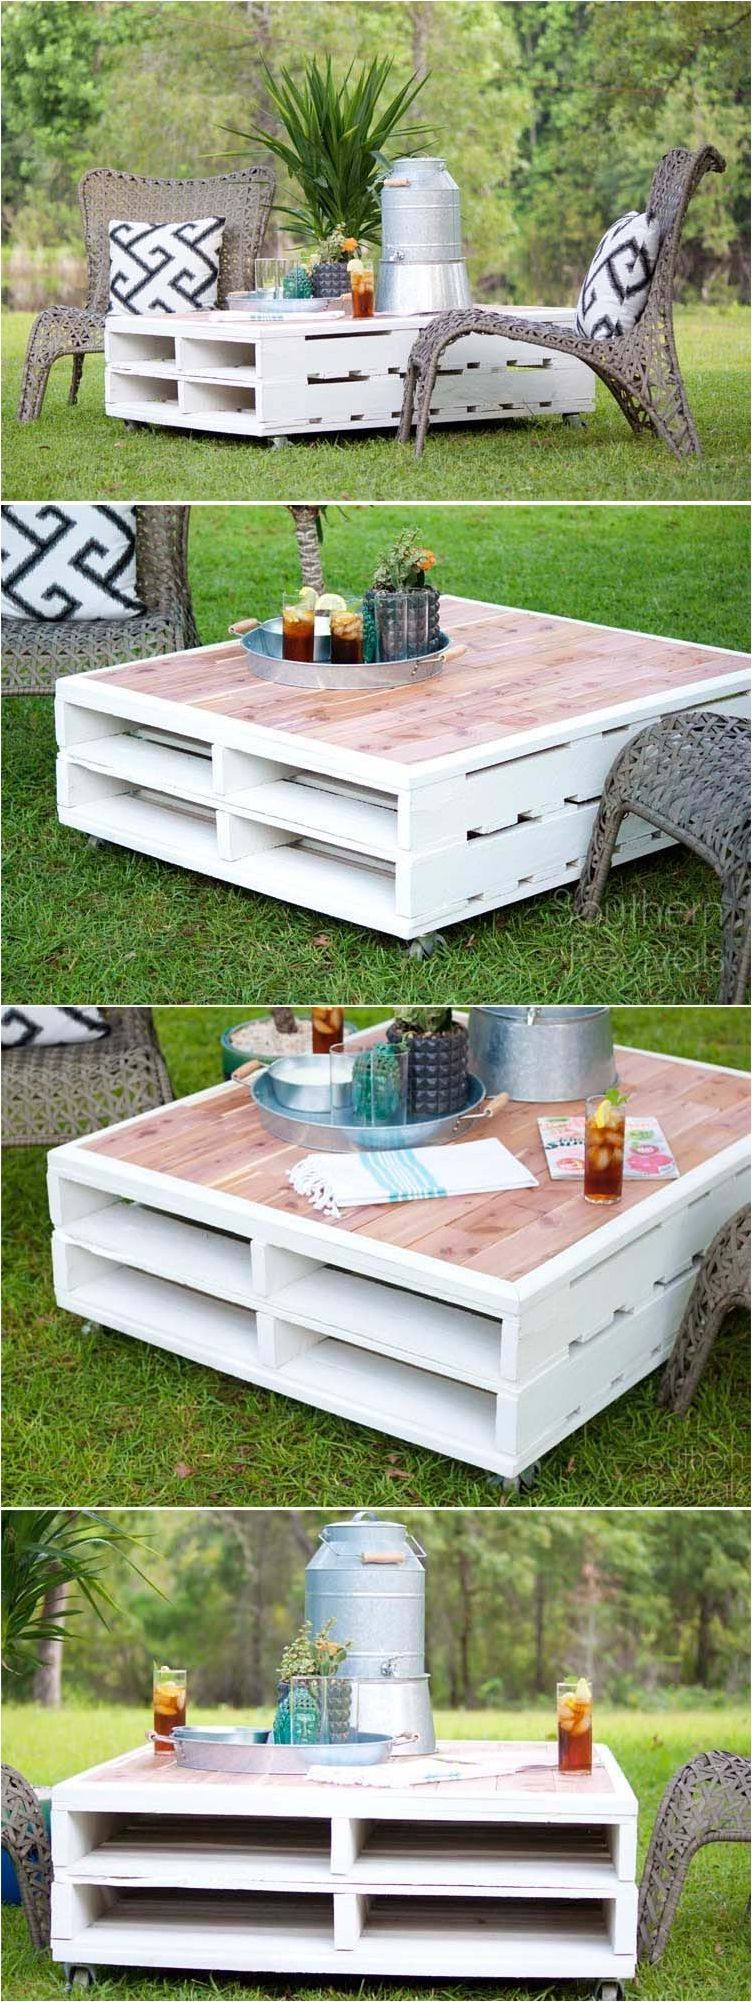 #kitchen #table #ideas Kitchen Table With Storage (Pros and Cons Kitchen Table With Storage)